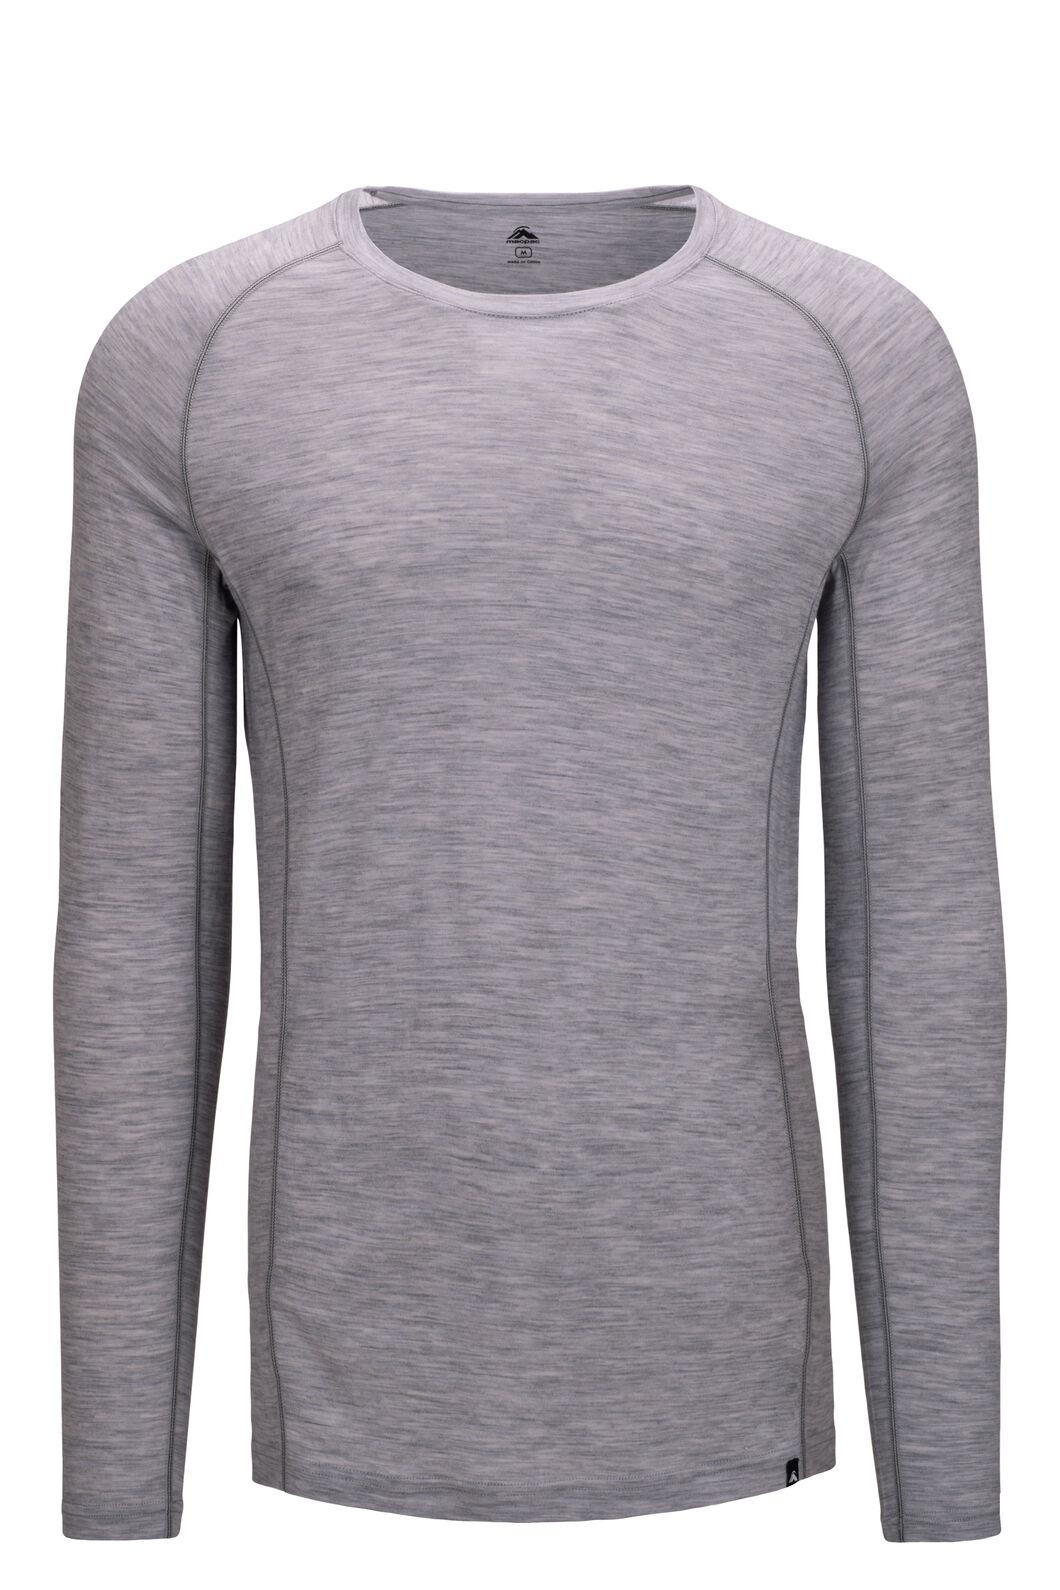 Macpac Men's 150 Merino Long Sleeve Top, Light Grey Marle, hi-res